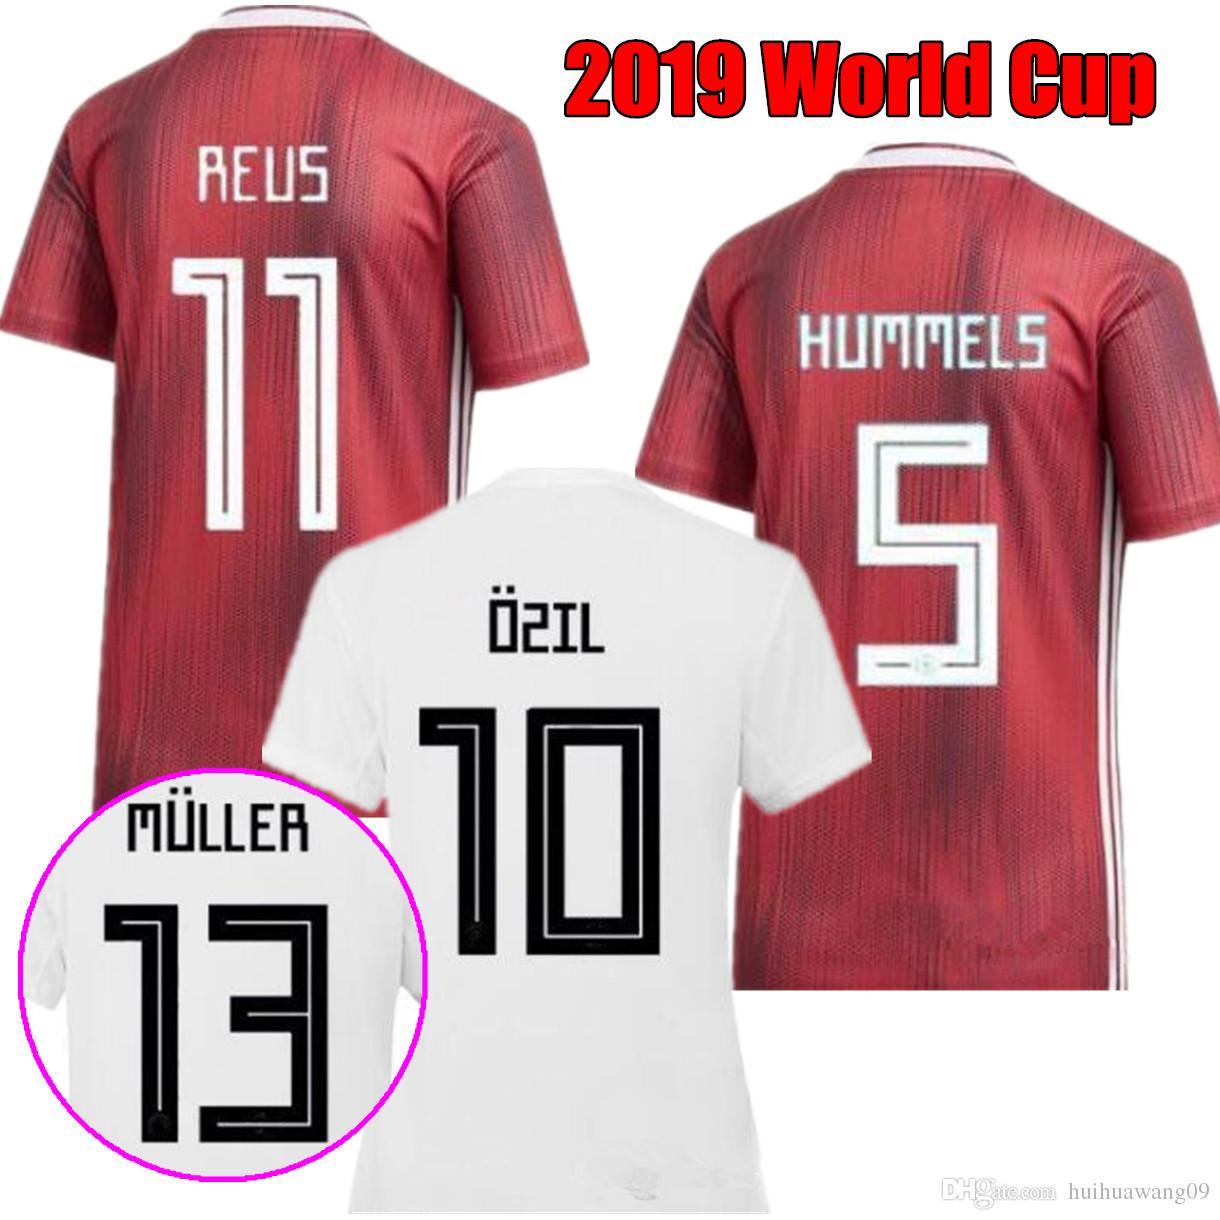 76efe55b760 World Cup 2019 Women Germany Home Away Soccer Jersey DALLMANN POPP ...